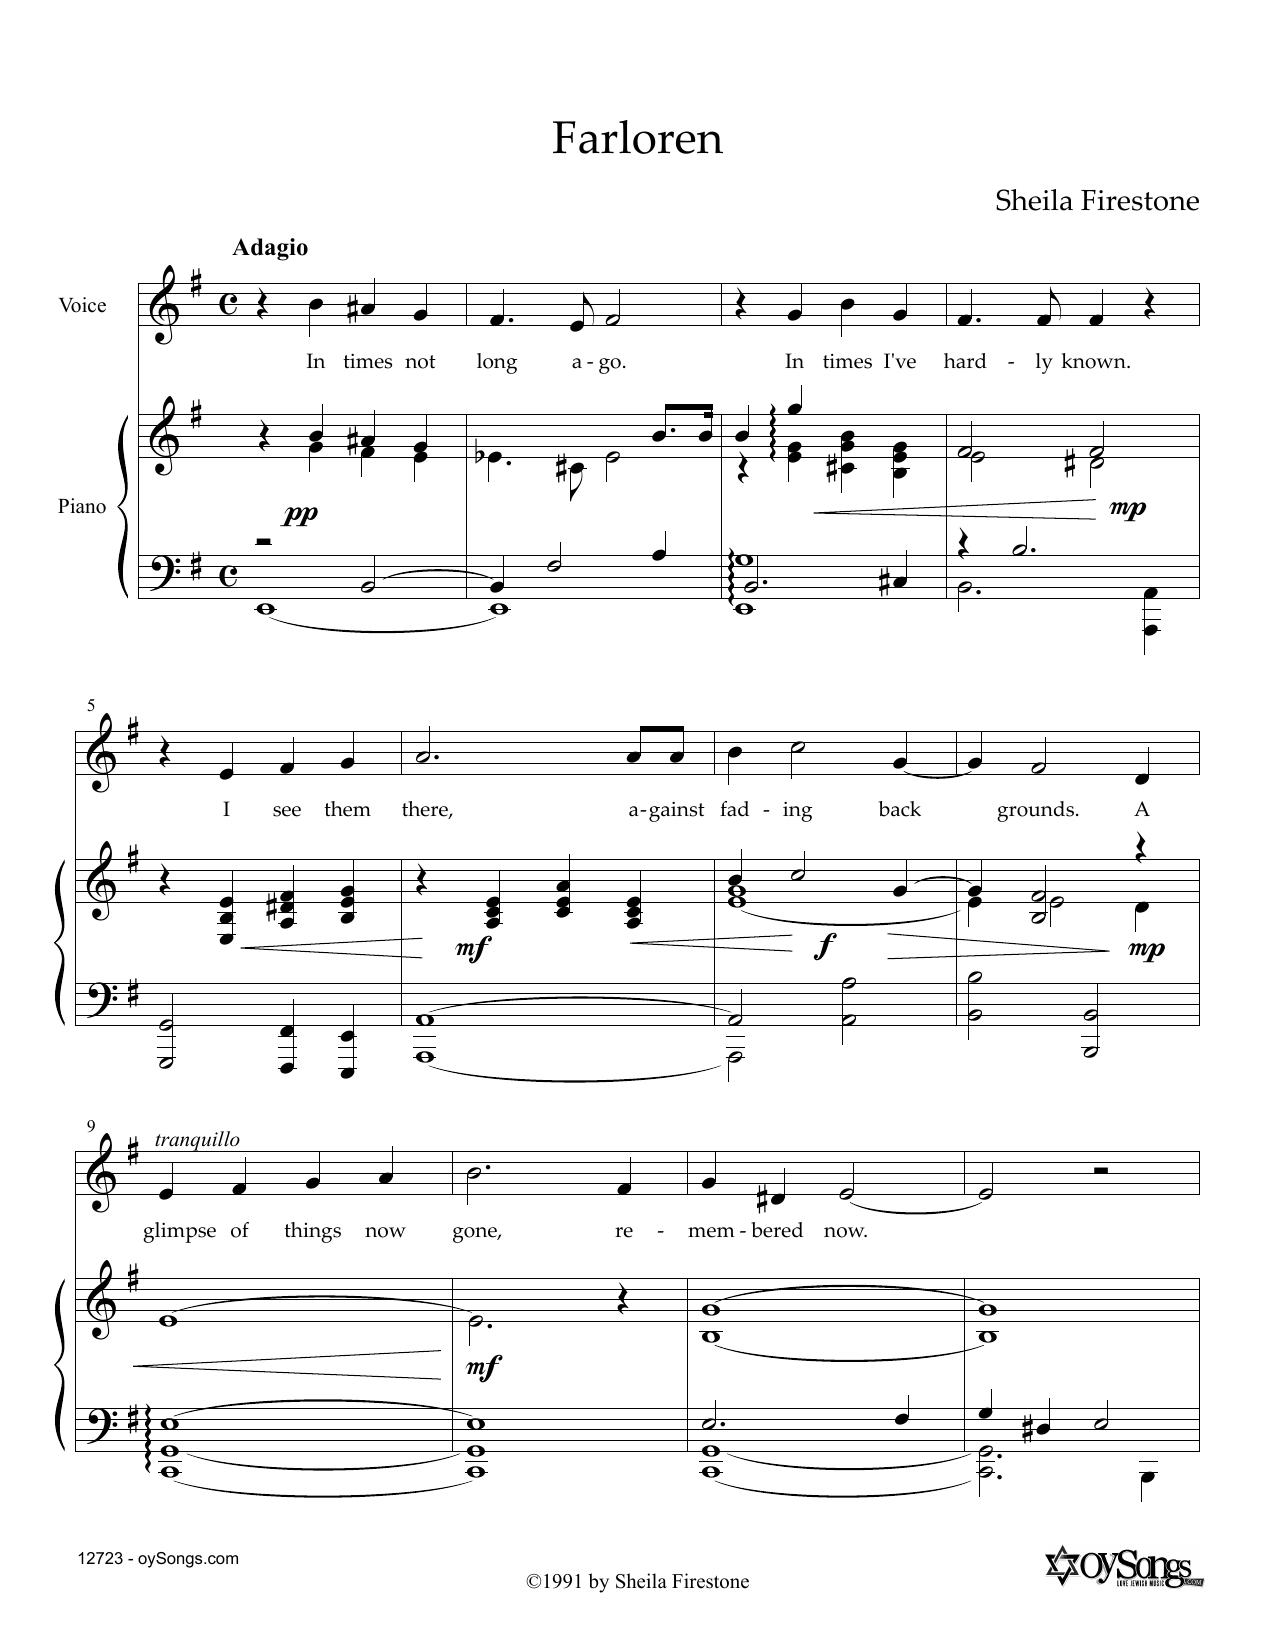 Farloren Sheet Music